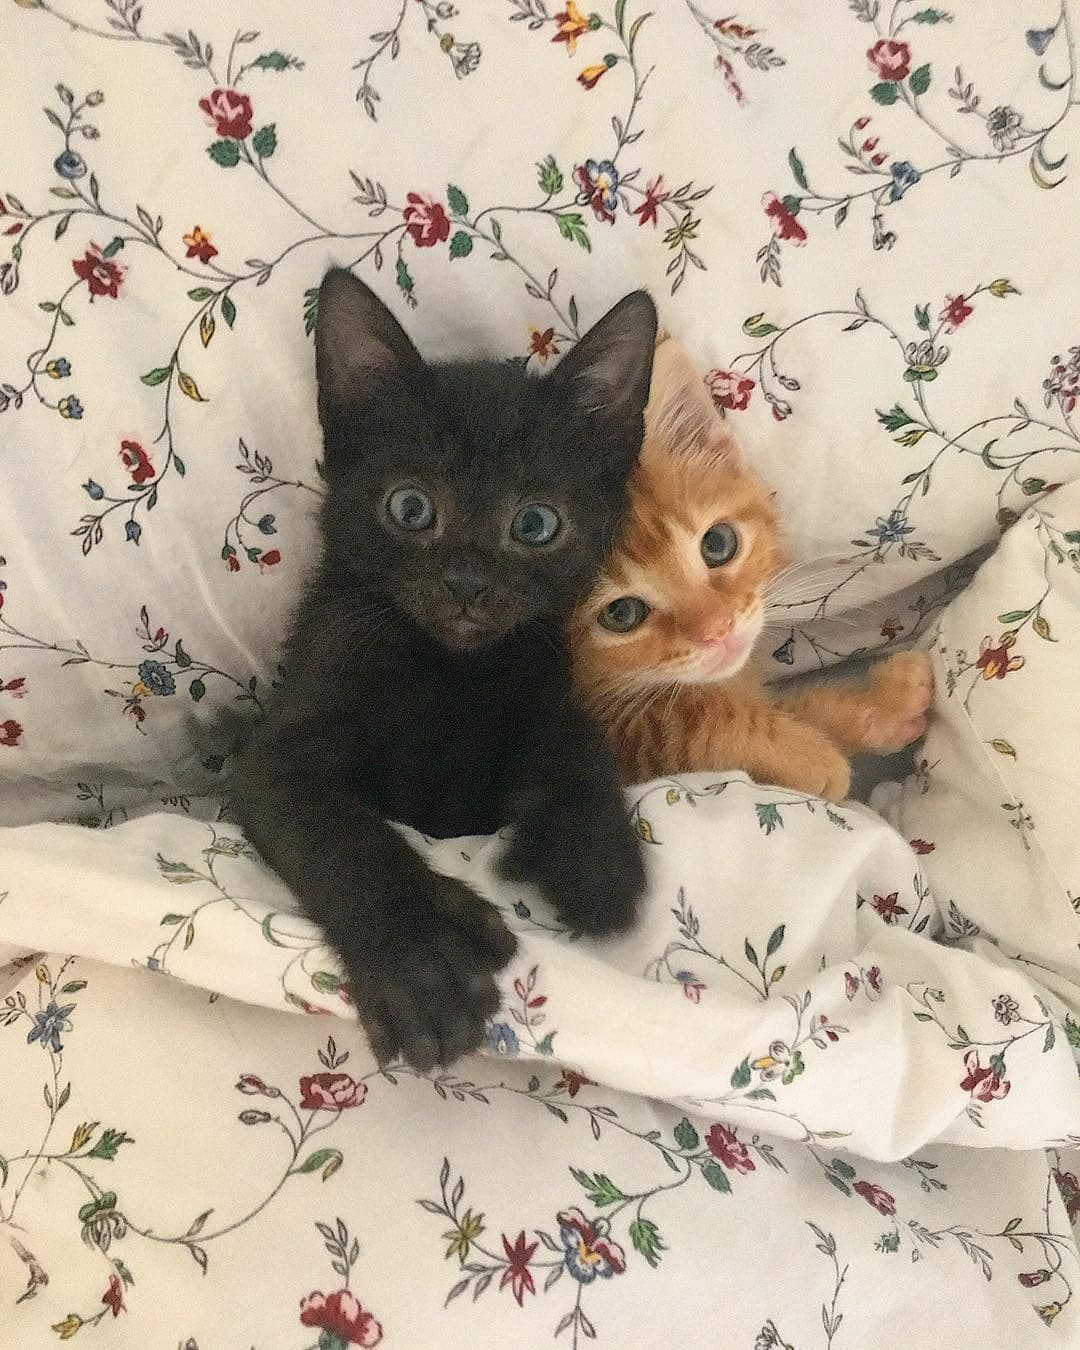 Pleasant Cats On Instagram Orlandokittenmom Happy Caturday Pleasantcats Smukke Katte Nuttede Dyreborn Dyr